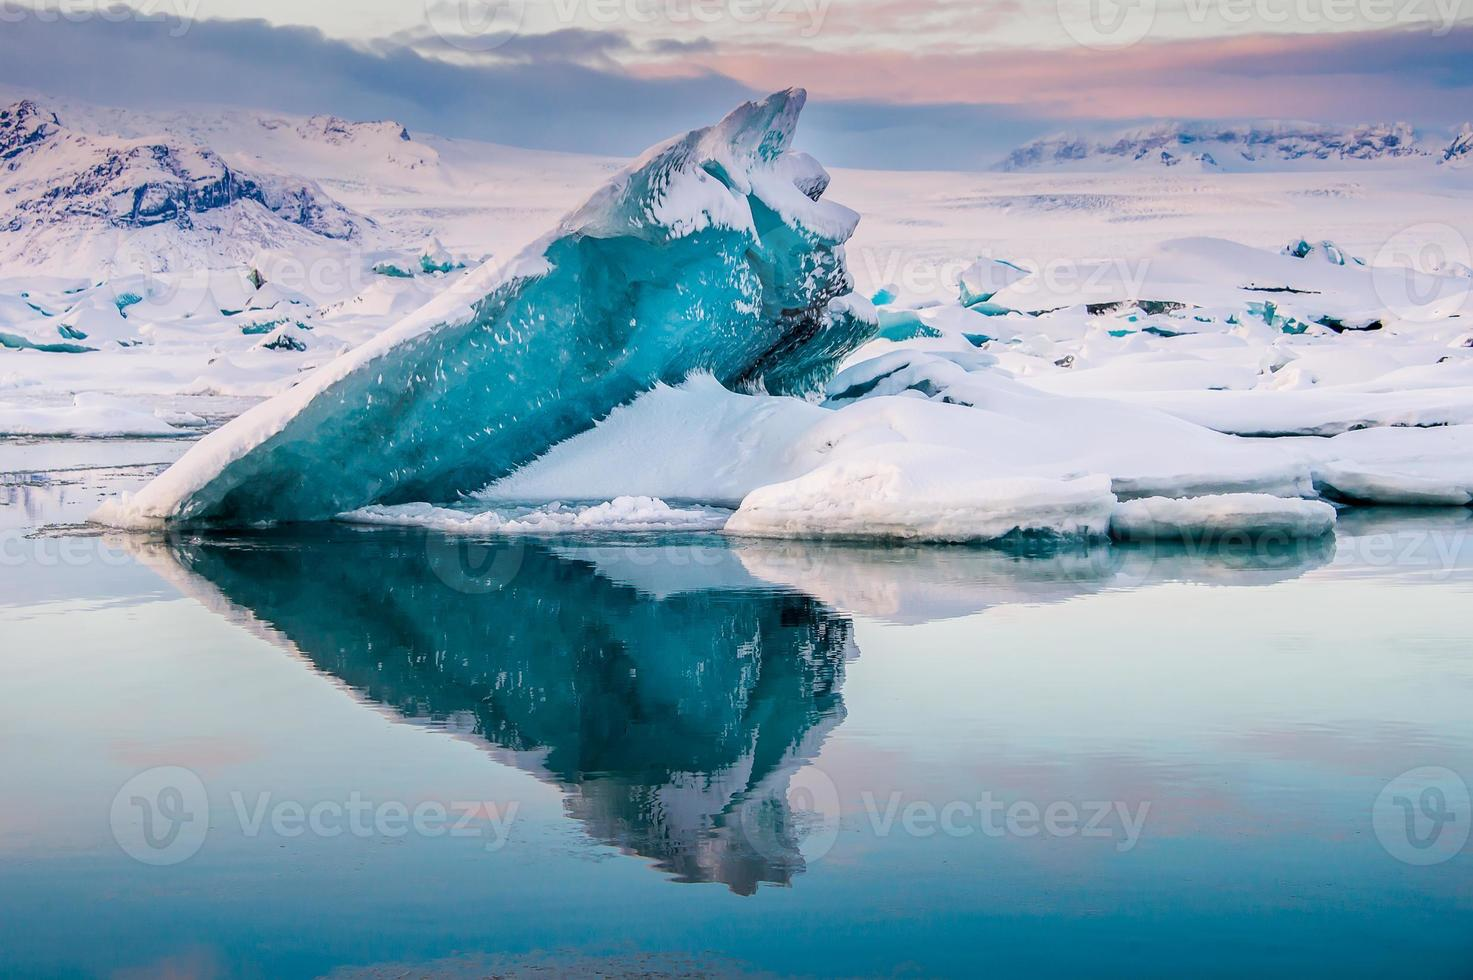 Magnifique lagon bleu jokulsaron lagoon, Islande photo